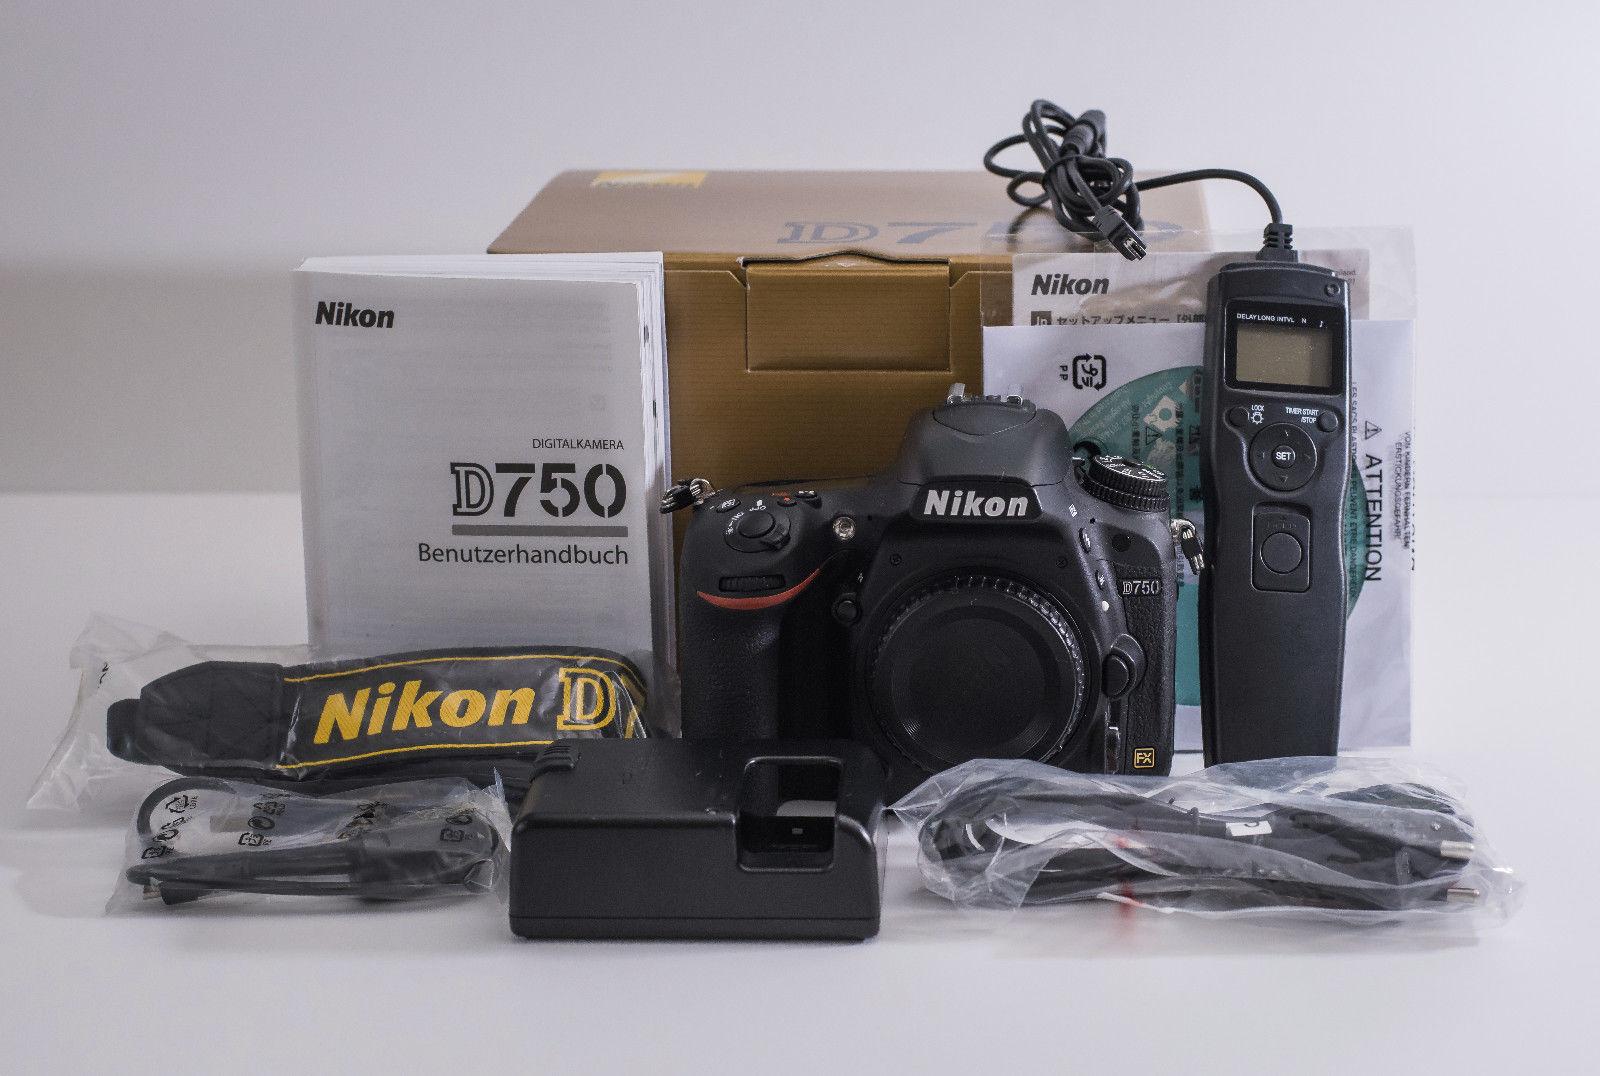 Nikon D750 24.3 MP SLR-Digitalkamera ein Jahr ALT!